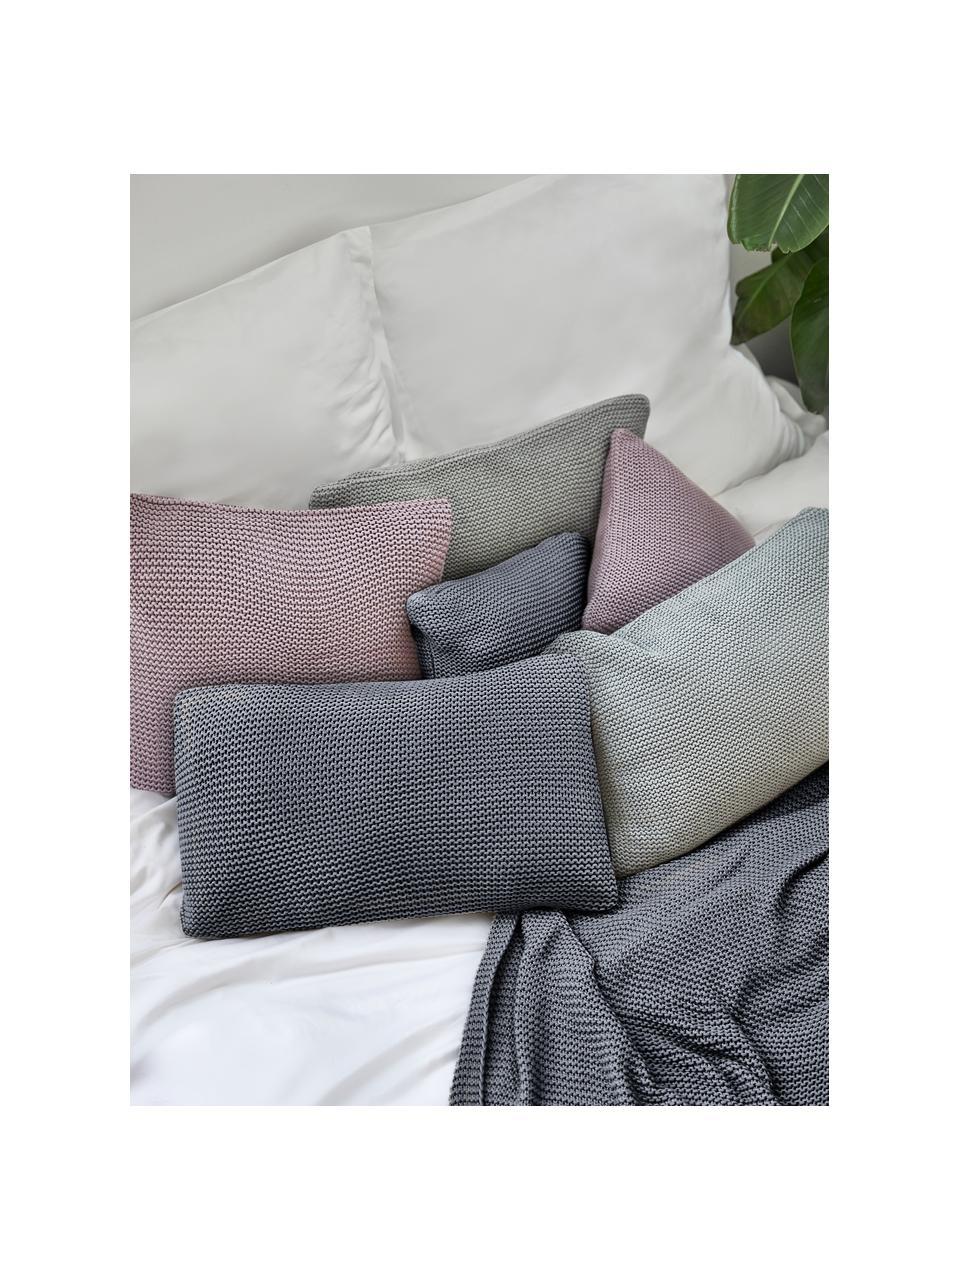 Strick-Kissenhülle Adalyn aus Bio-Baumwolle in Grau, 100% Bio-Baumwolle, GOTS-zertifiziert, Grau, 40 x 60 cm